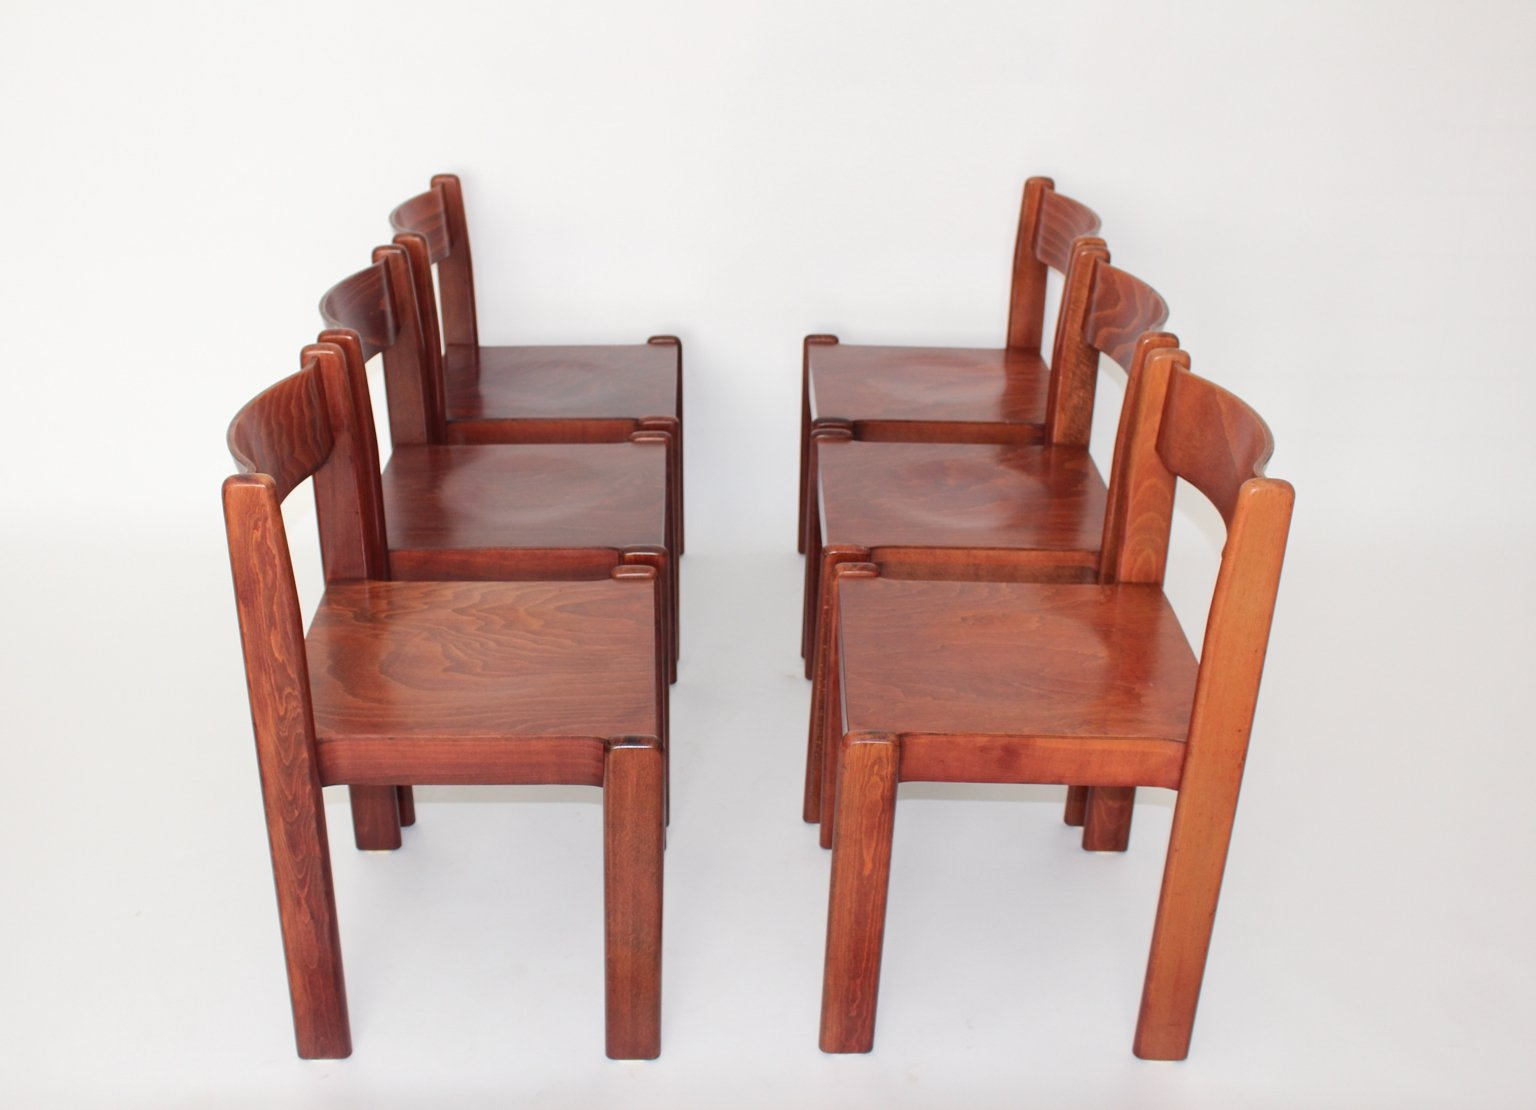 Brown Italian Dining Room Chair 1970s